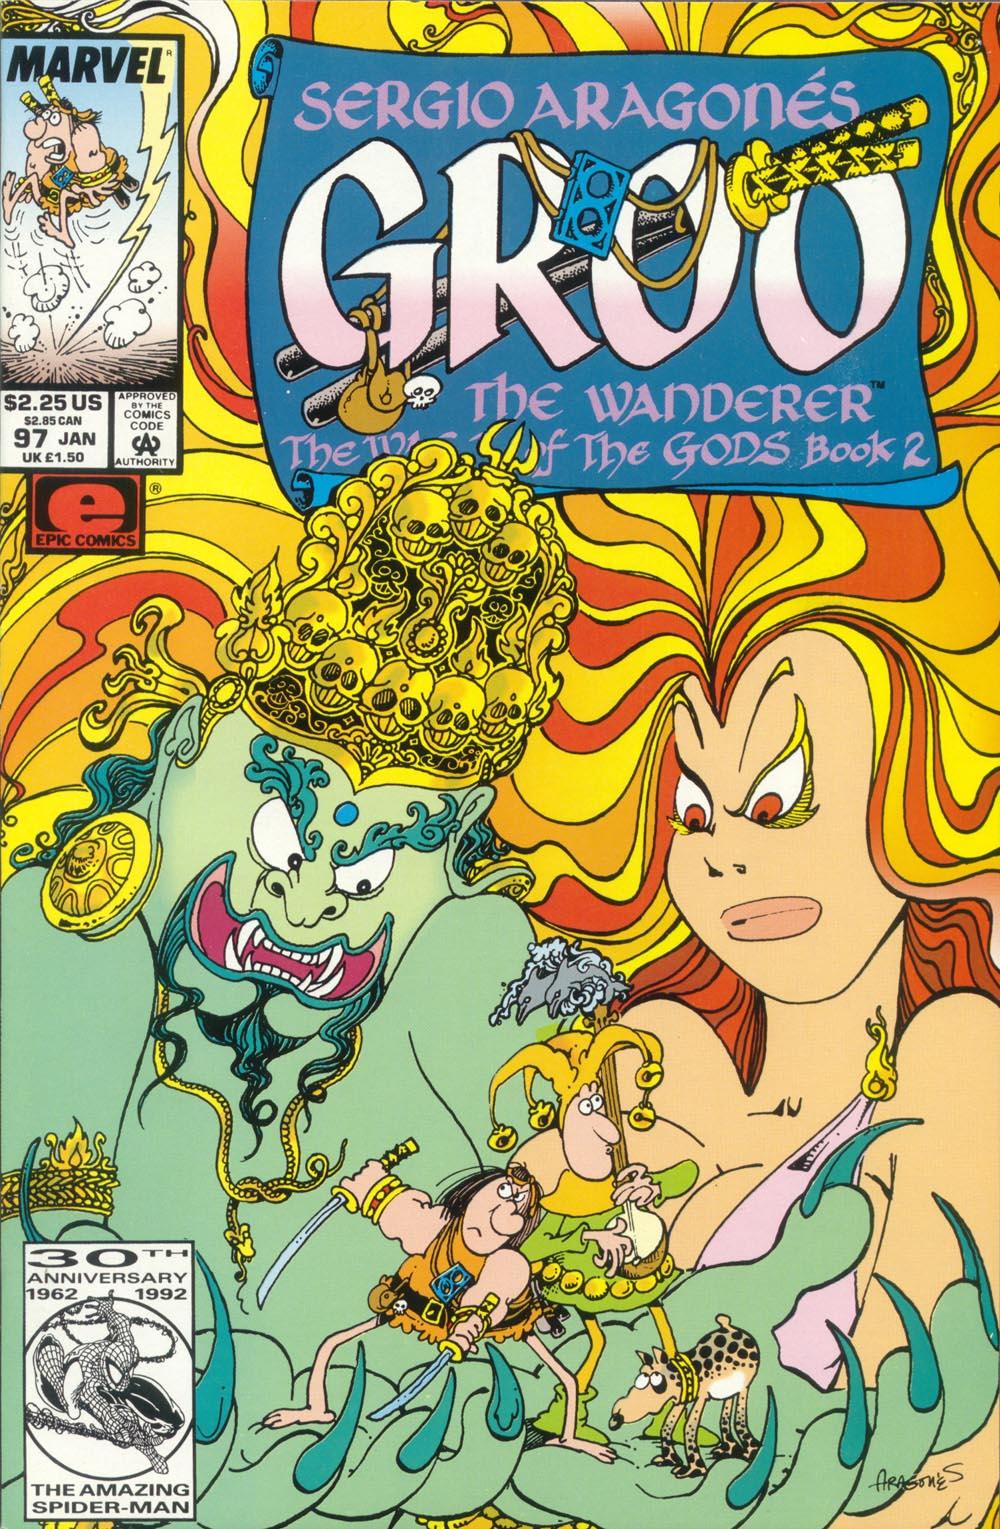 Read online Sergio Aragonés Groo the Wanderer comic -  Issue #97 - 1